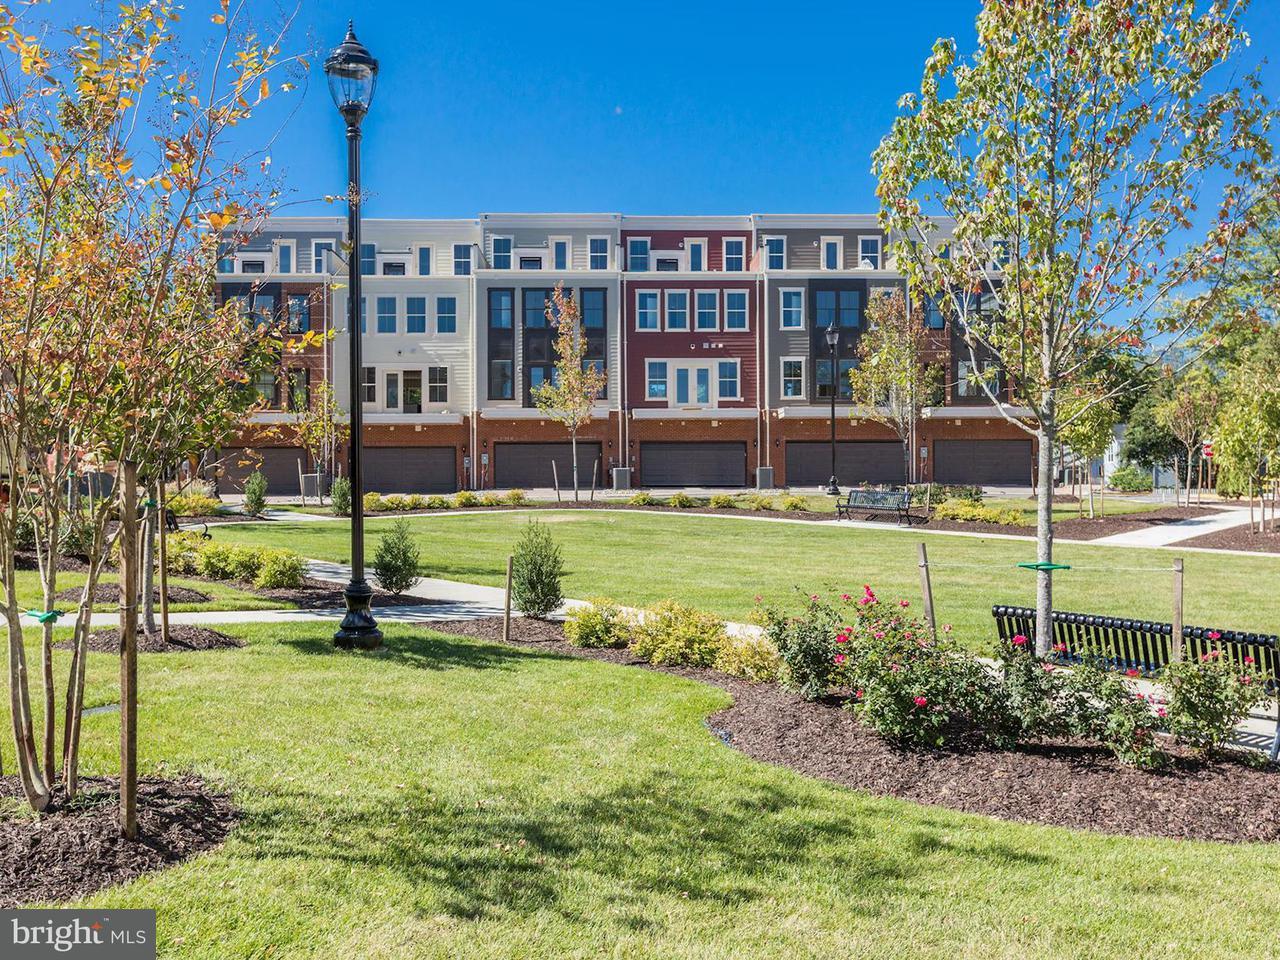 Additional photo for property listing at 3957 Oak St #0 3957 Oak St #0 Fairfax, Virginia 22030 Estados Unidos